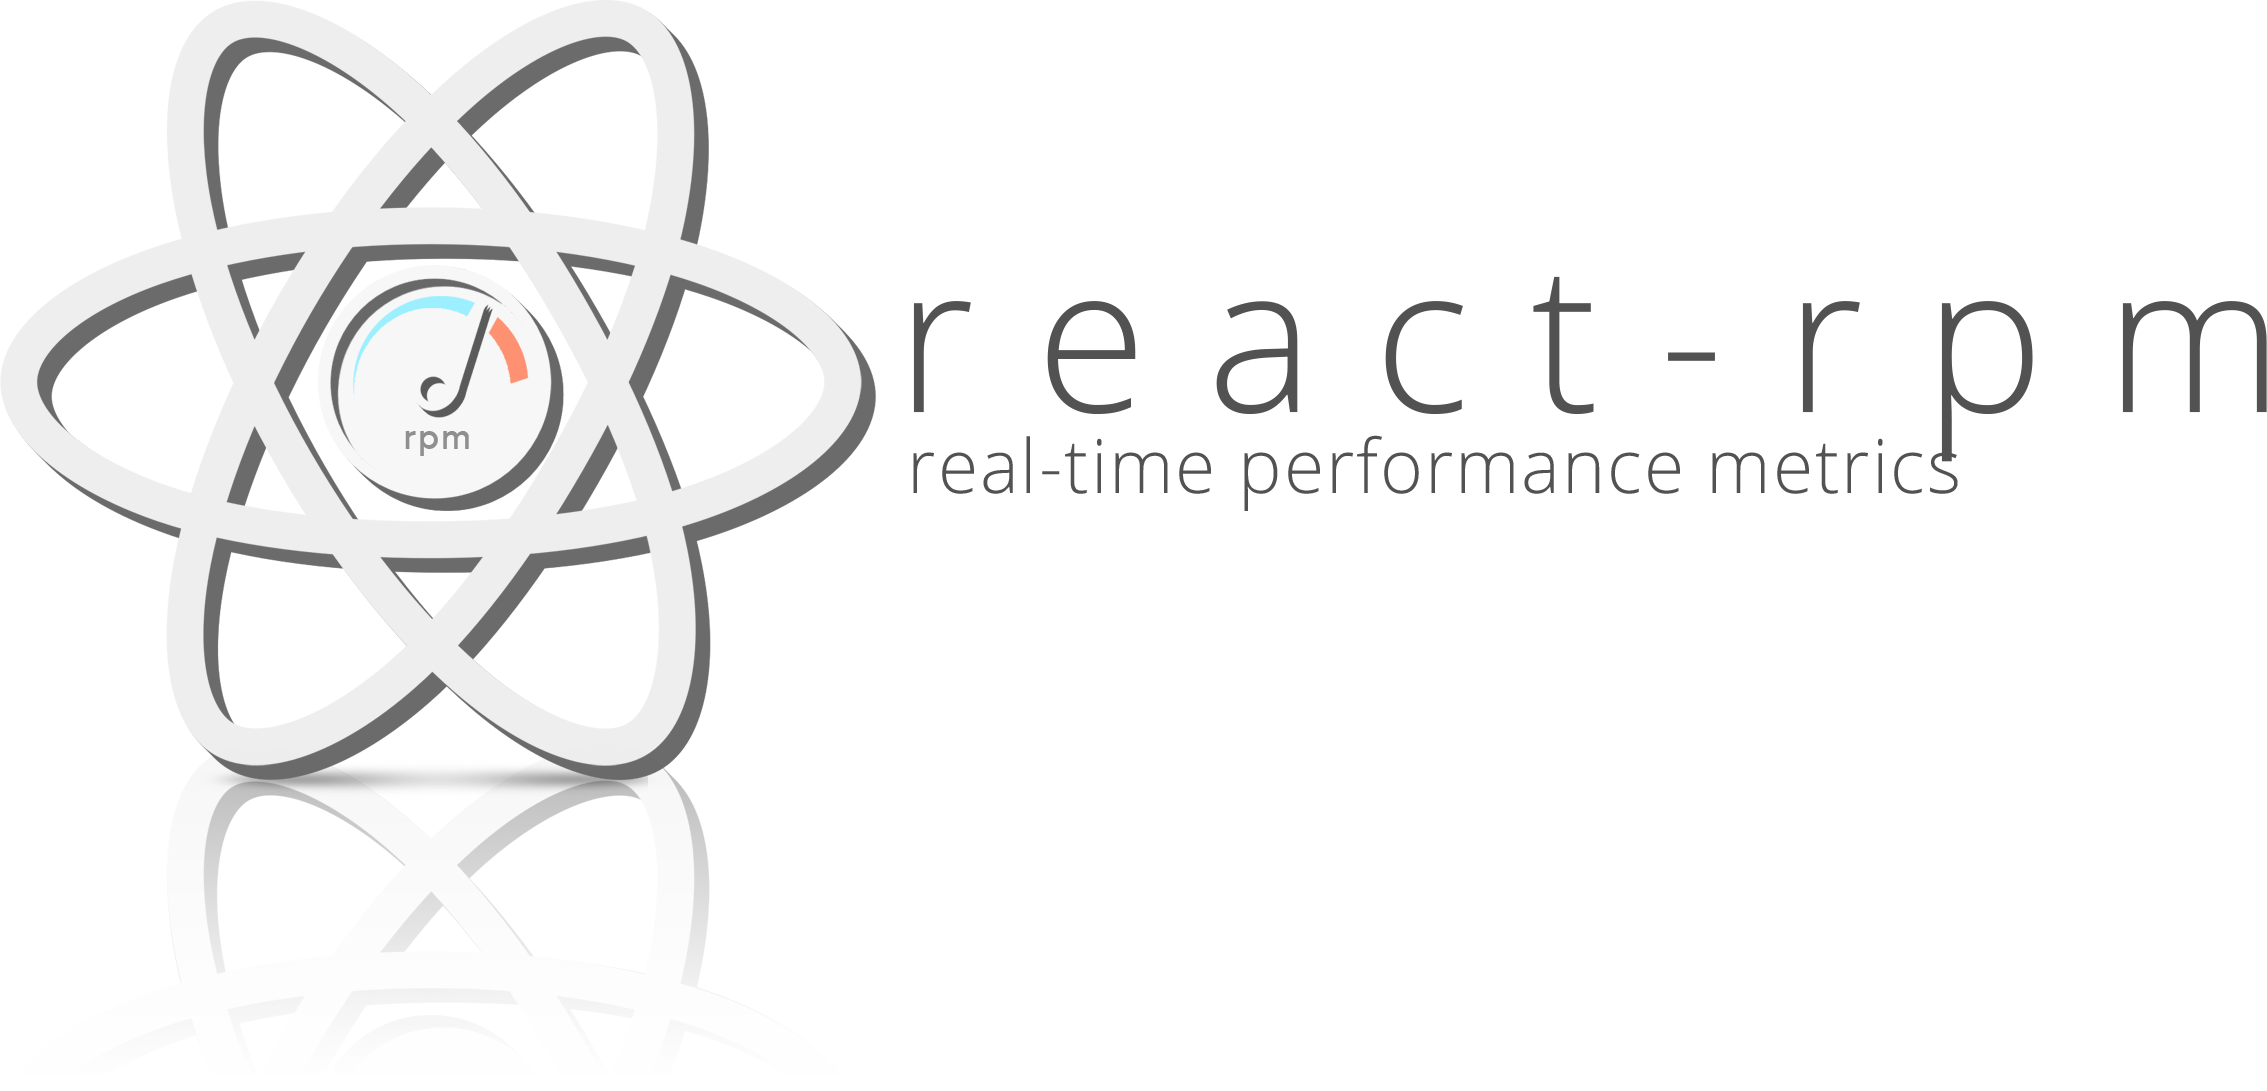 react-rpm